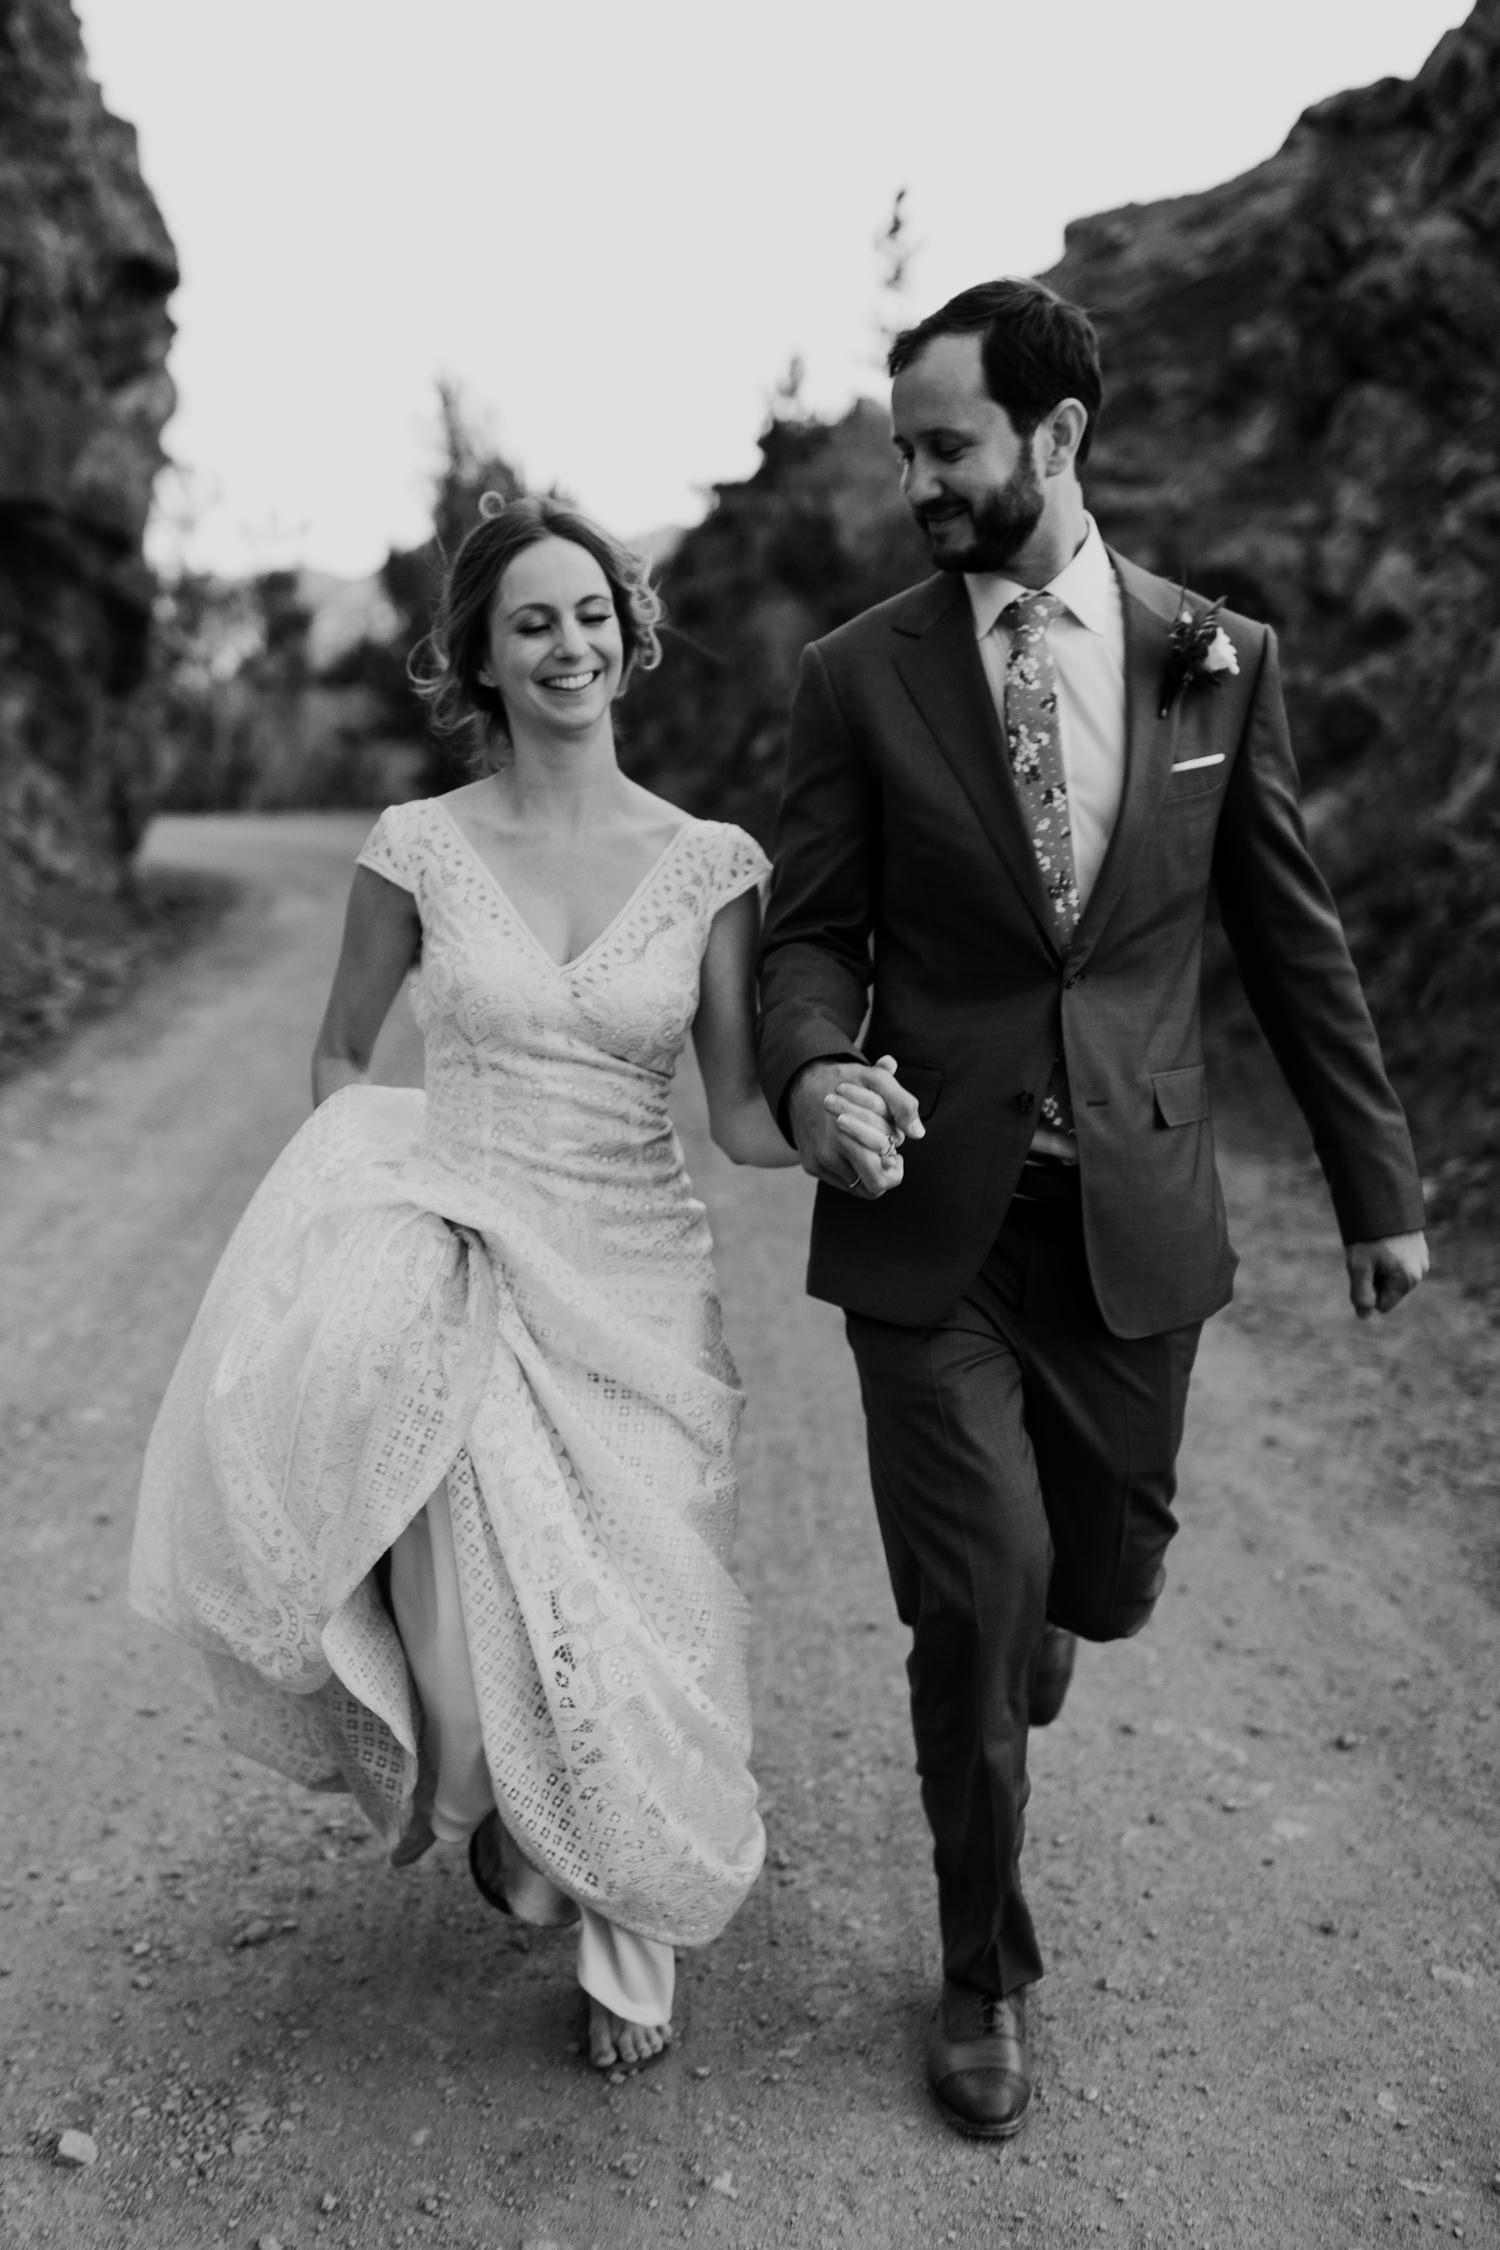 bohemian-backyard-wedding-breckenridge-colorado-132.jpg